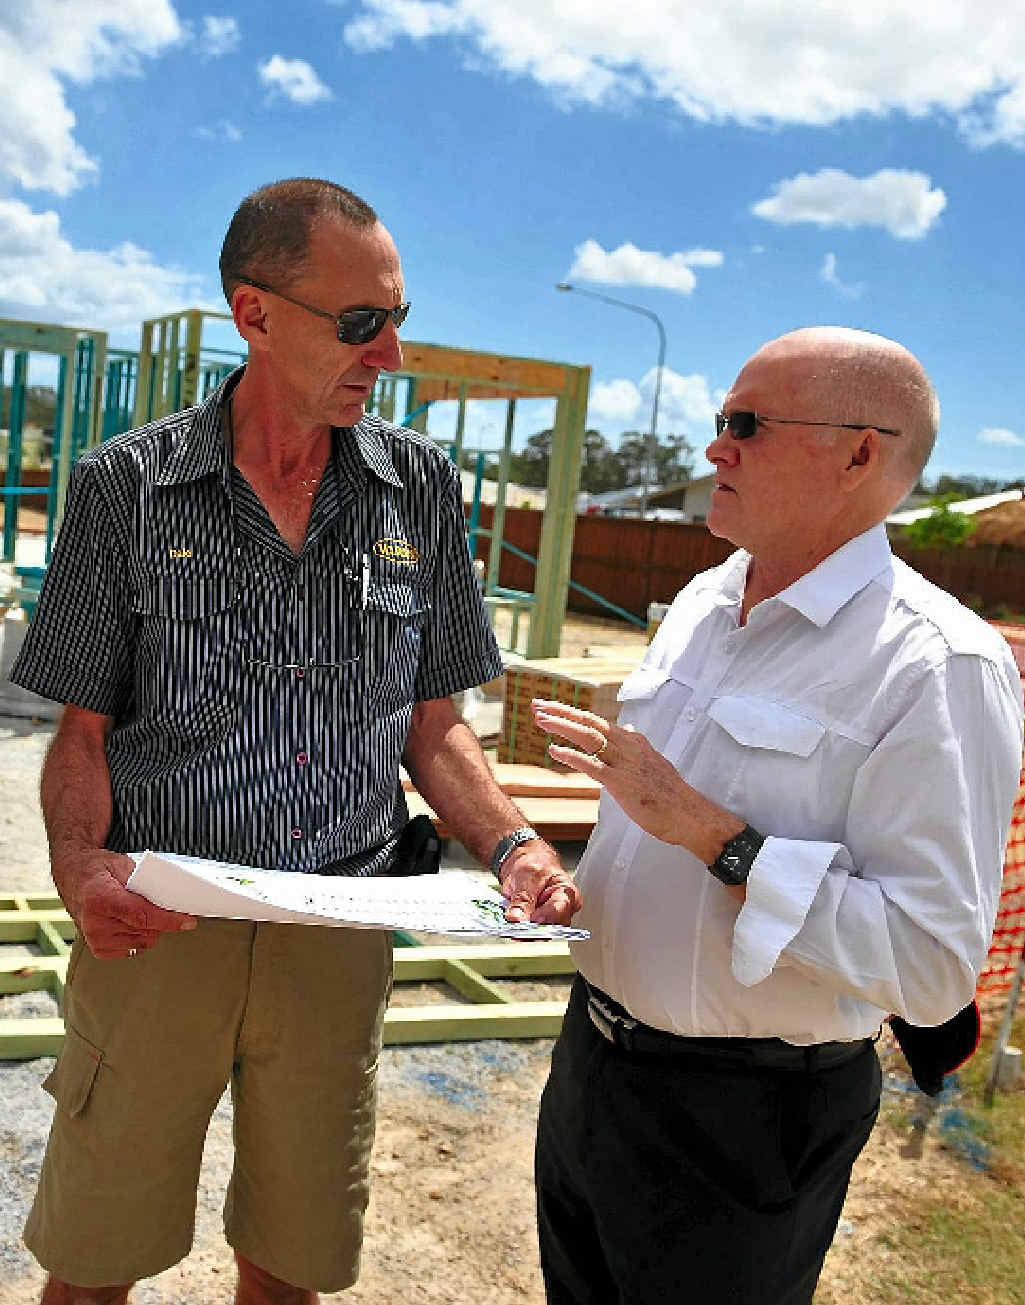 Urban Development Institute of Australia committee members Dale Ware and Neil Jessop discuss development in Gladstone.